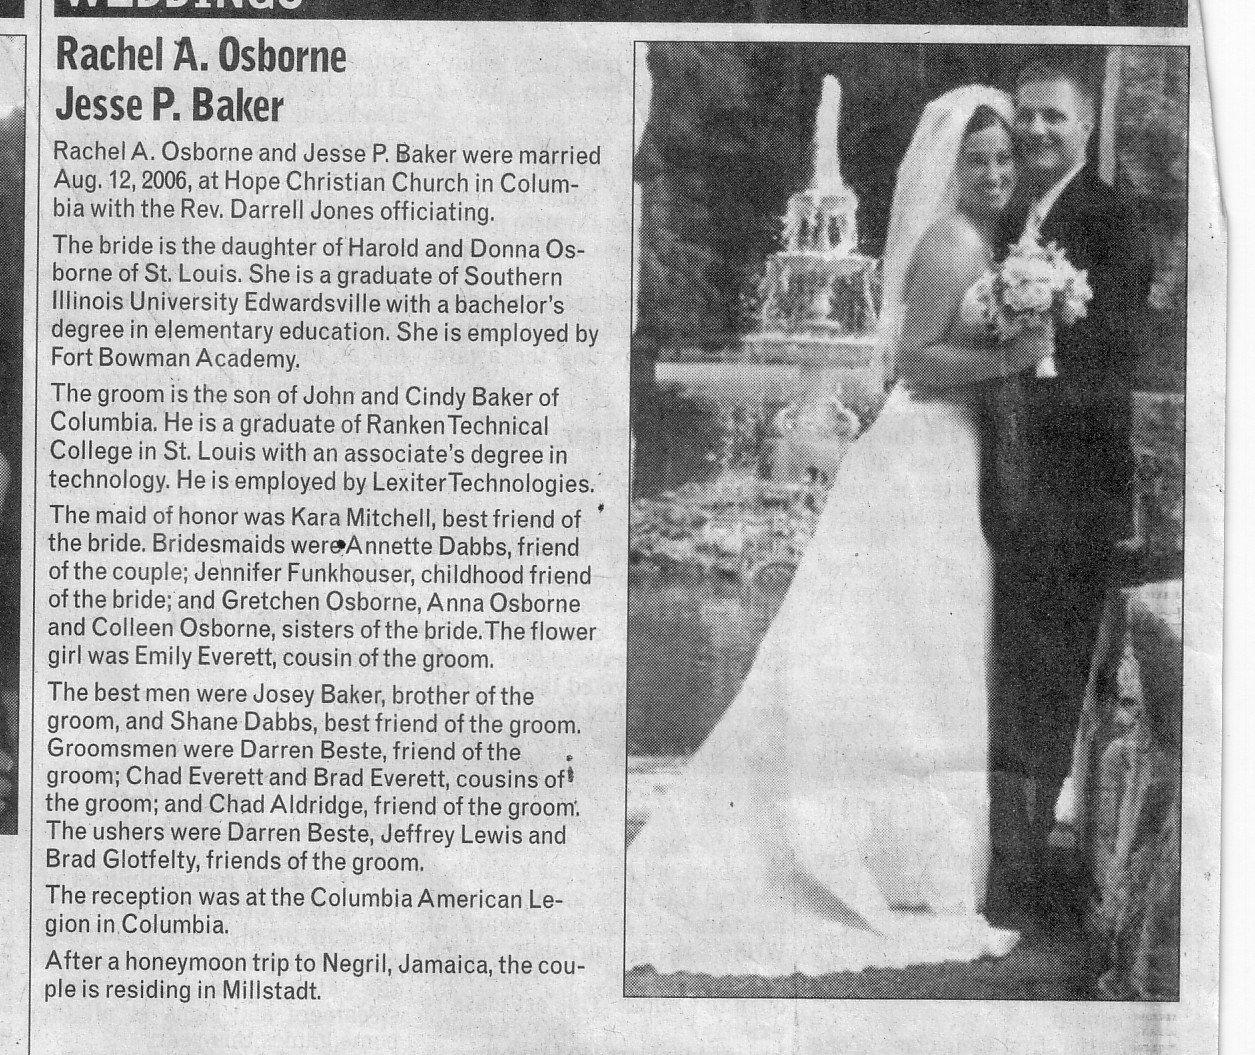 Newspaper Wedding Announcement Template Beautiful Wedding Announcements